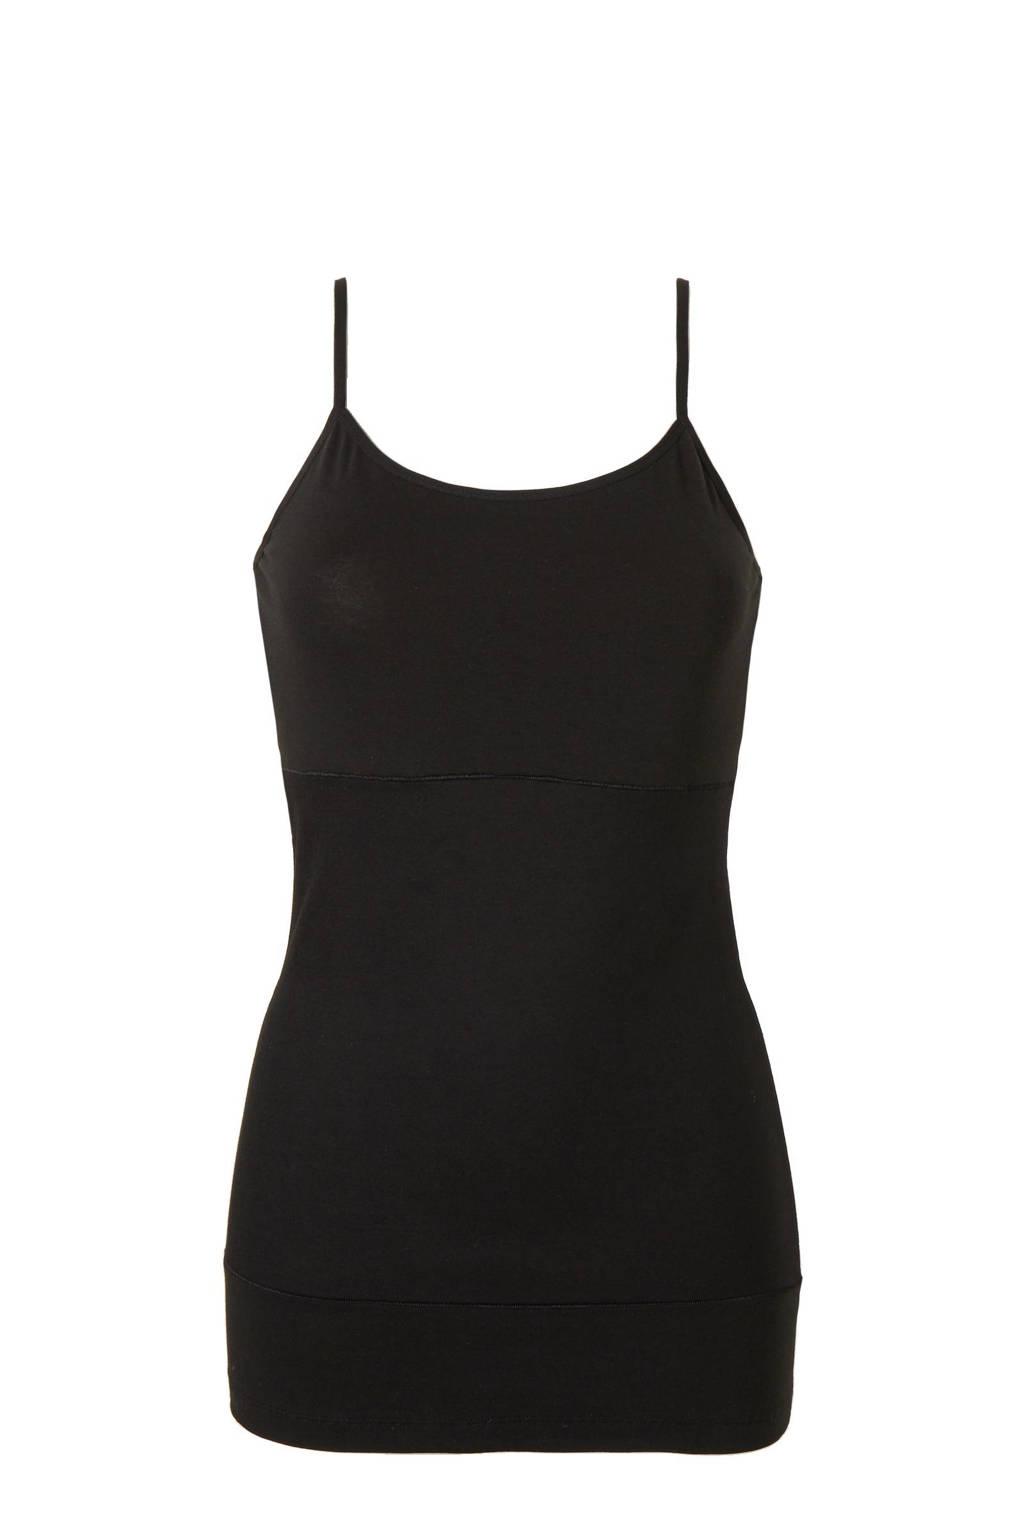 whkmp's own corrigerend hemd zwart, Zwart